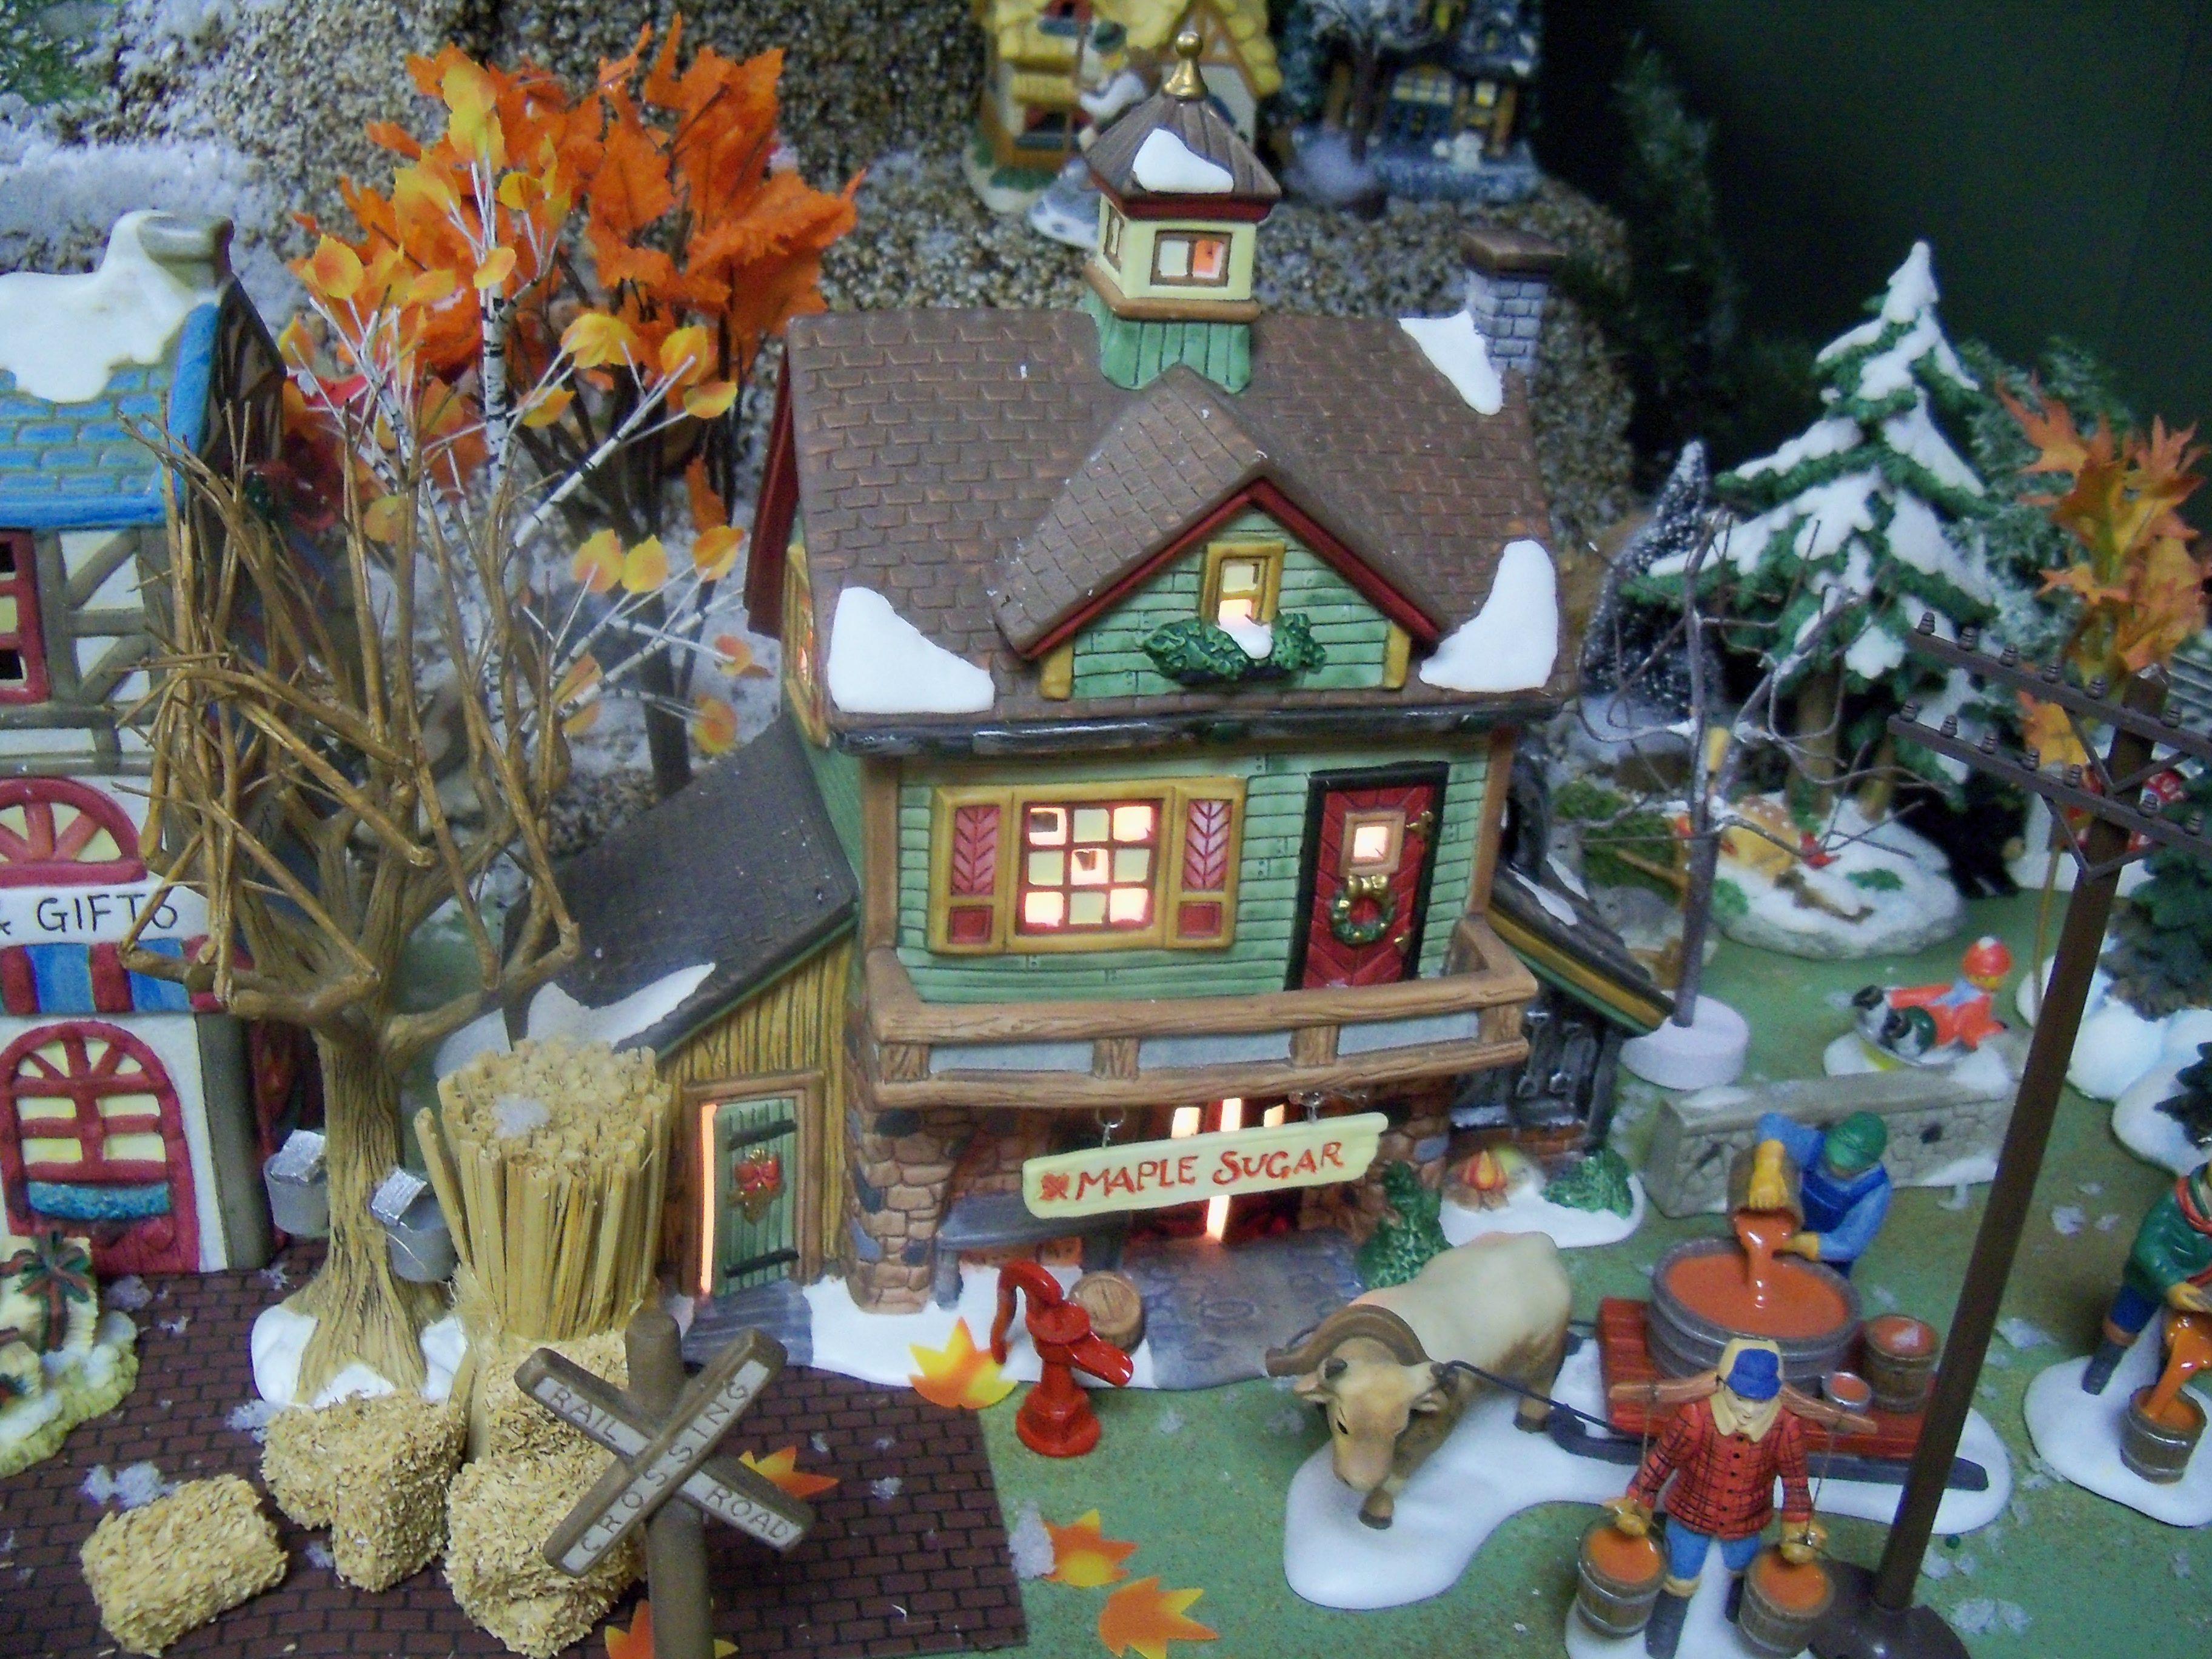 Scene from my Christmas village | My Christmas Village | Pinterest